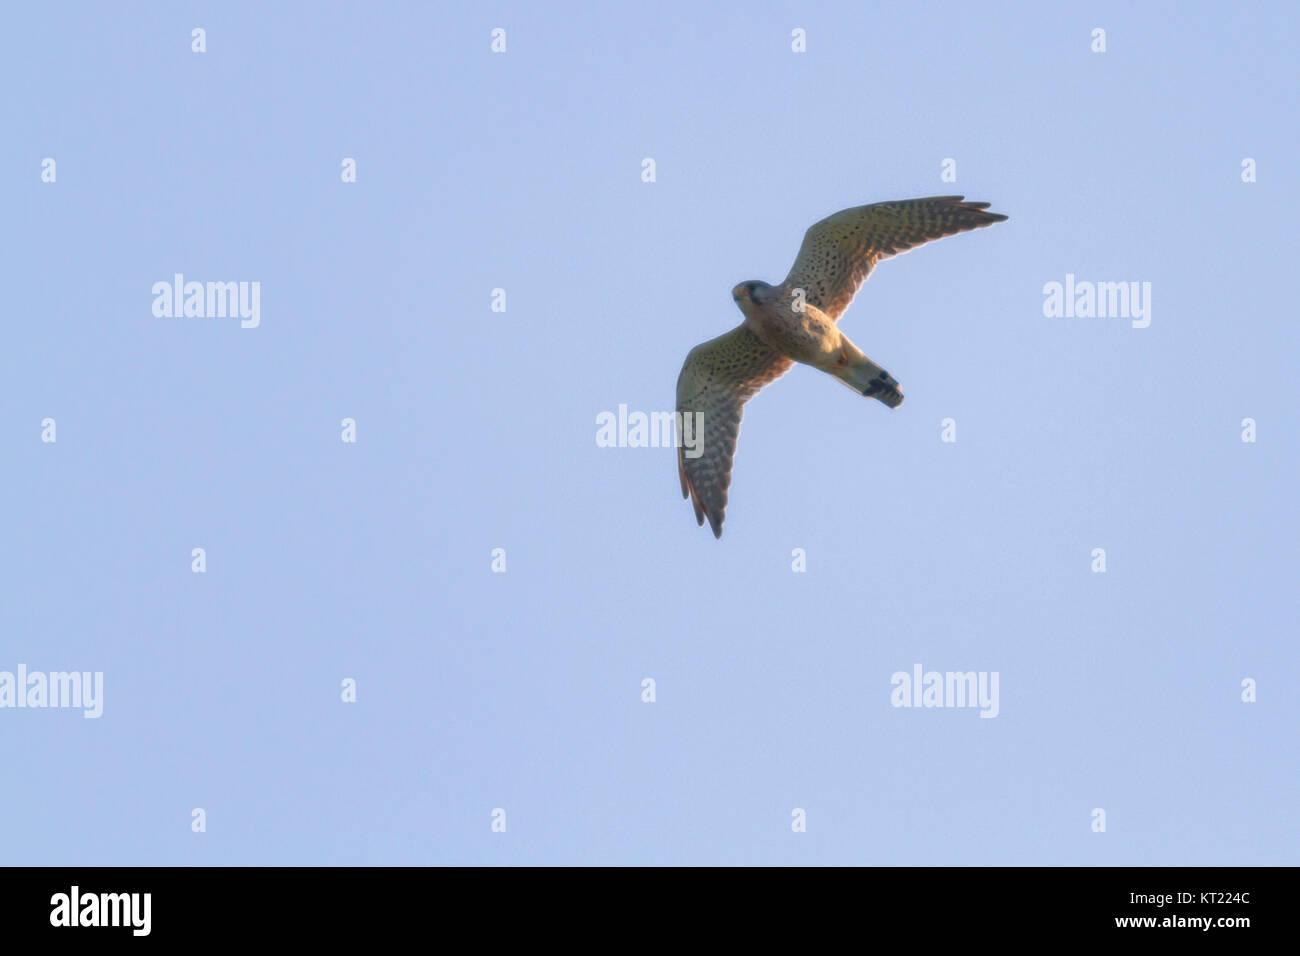 common krestel (falco tinnunculus) - Stock Image